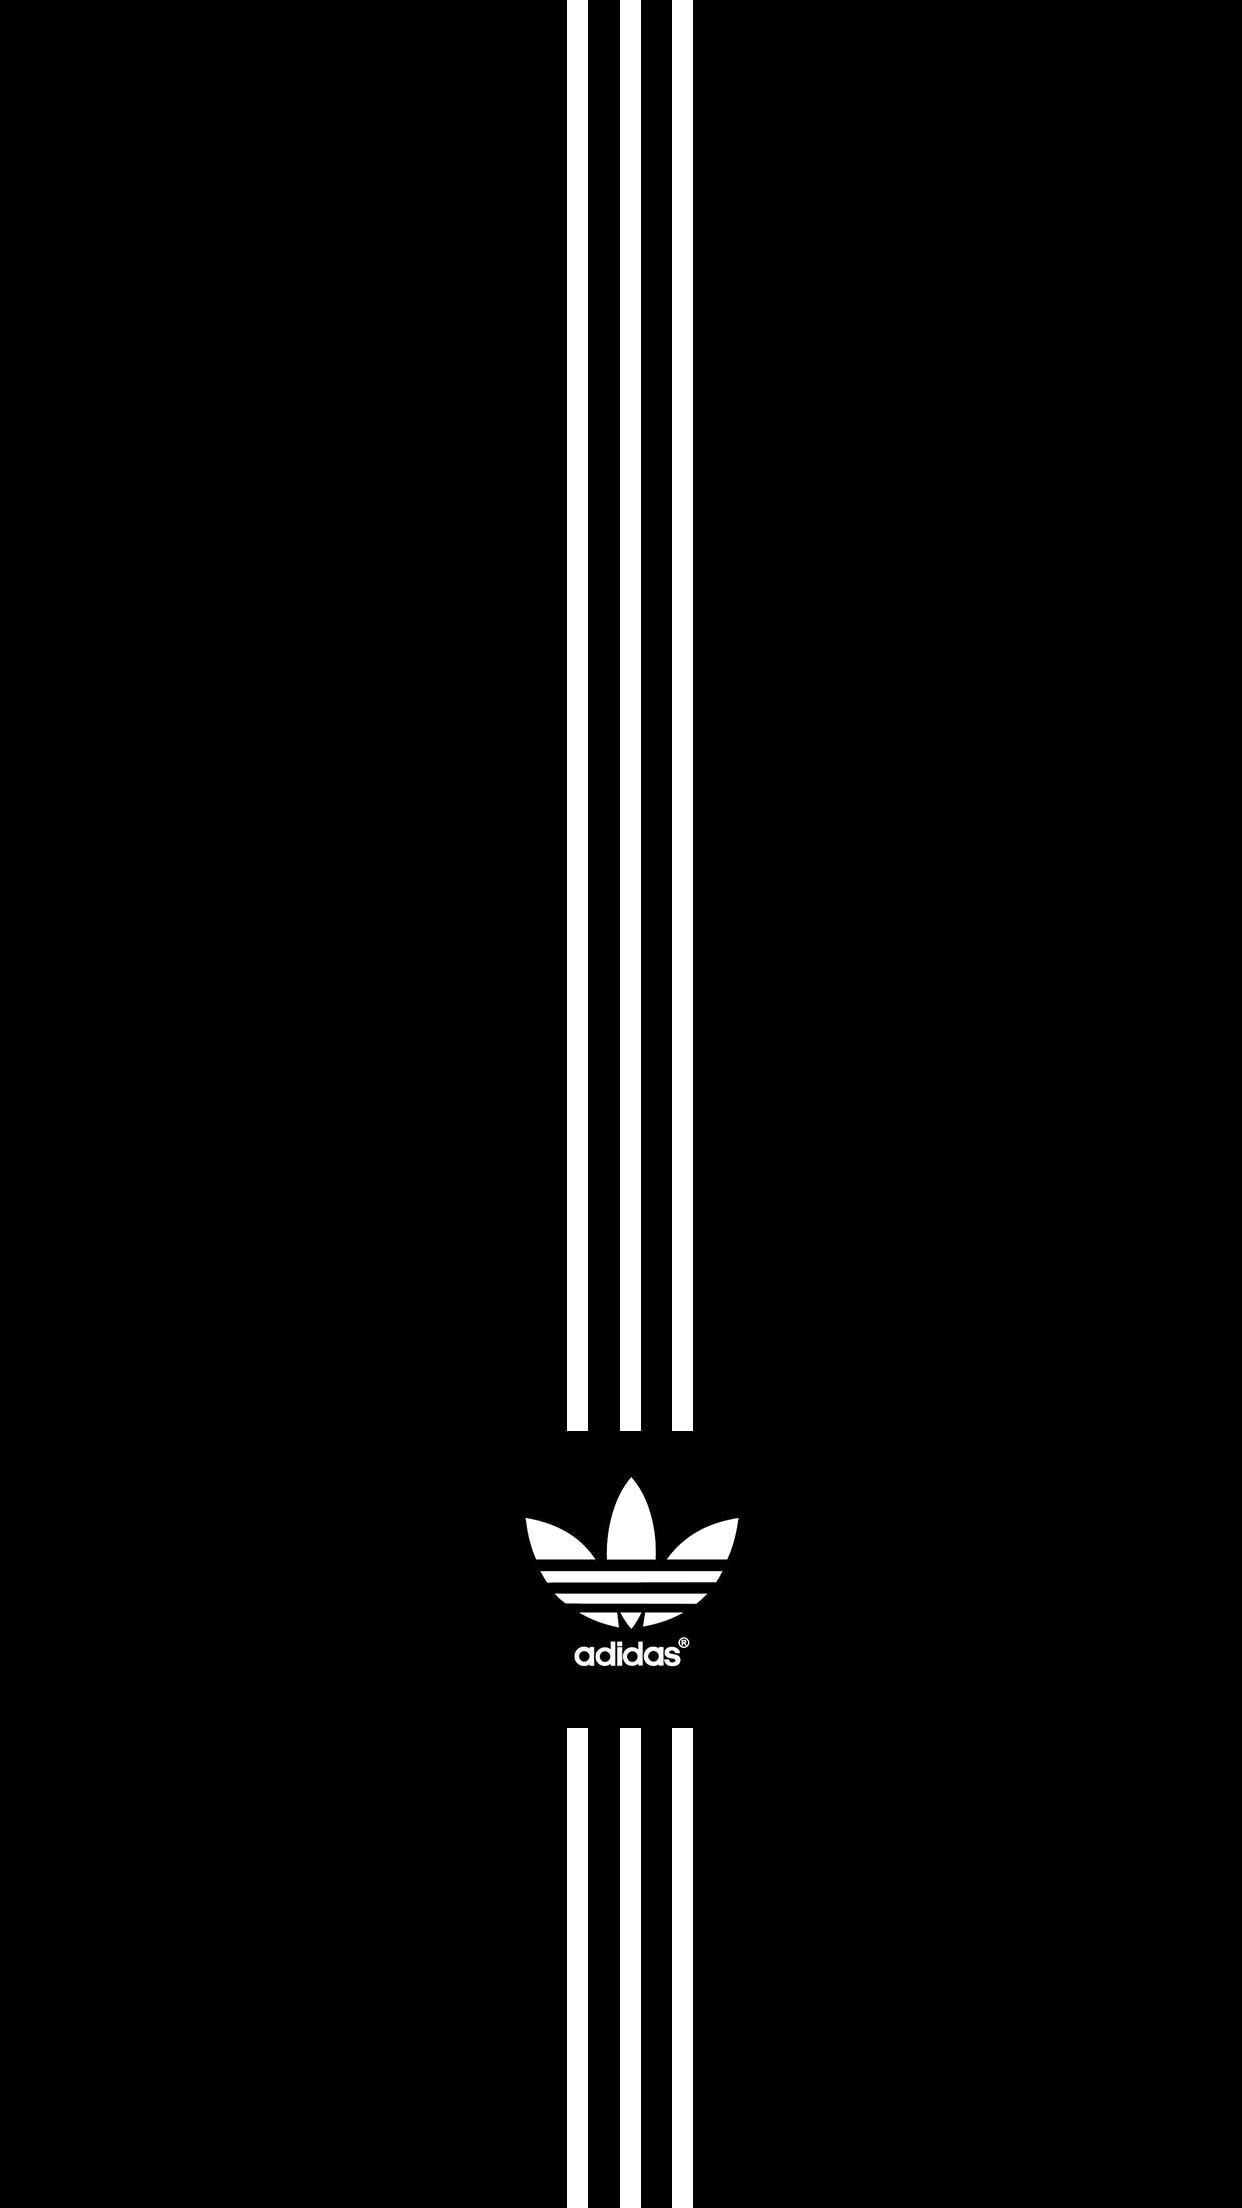 Adidas Logo Wallpaper (71+ pictures)